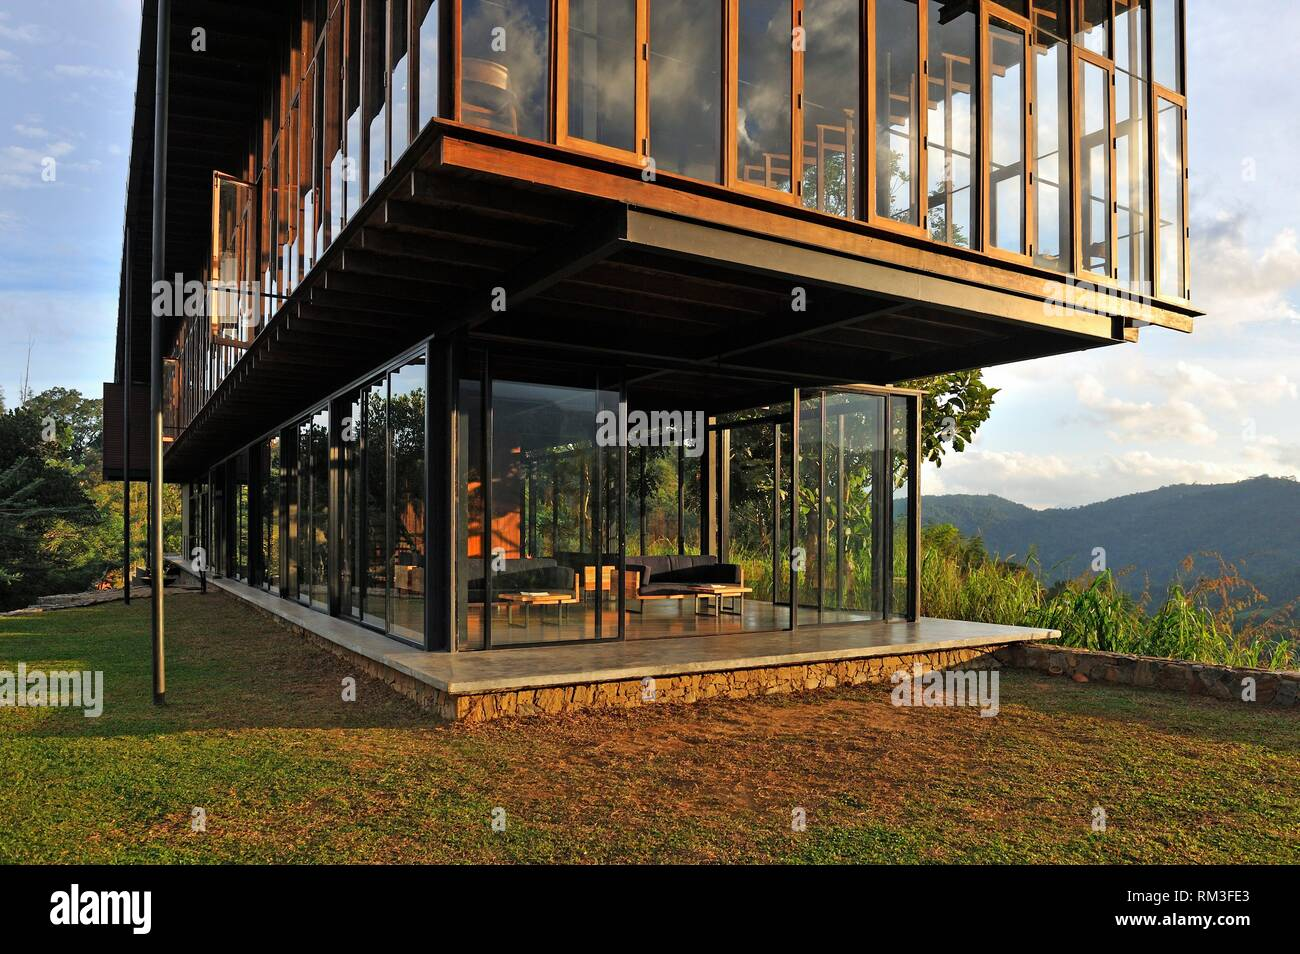 Santani Wellness Resort, Arantenna Estate,. Werapitiya, Kandy, Sri Lanka, Indian subcontinent, South Asia. - Stock Image